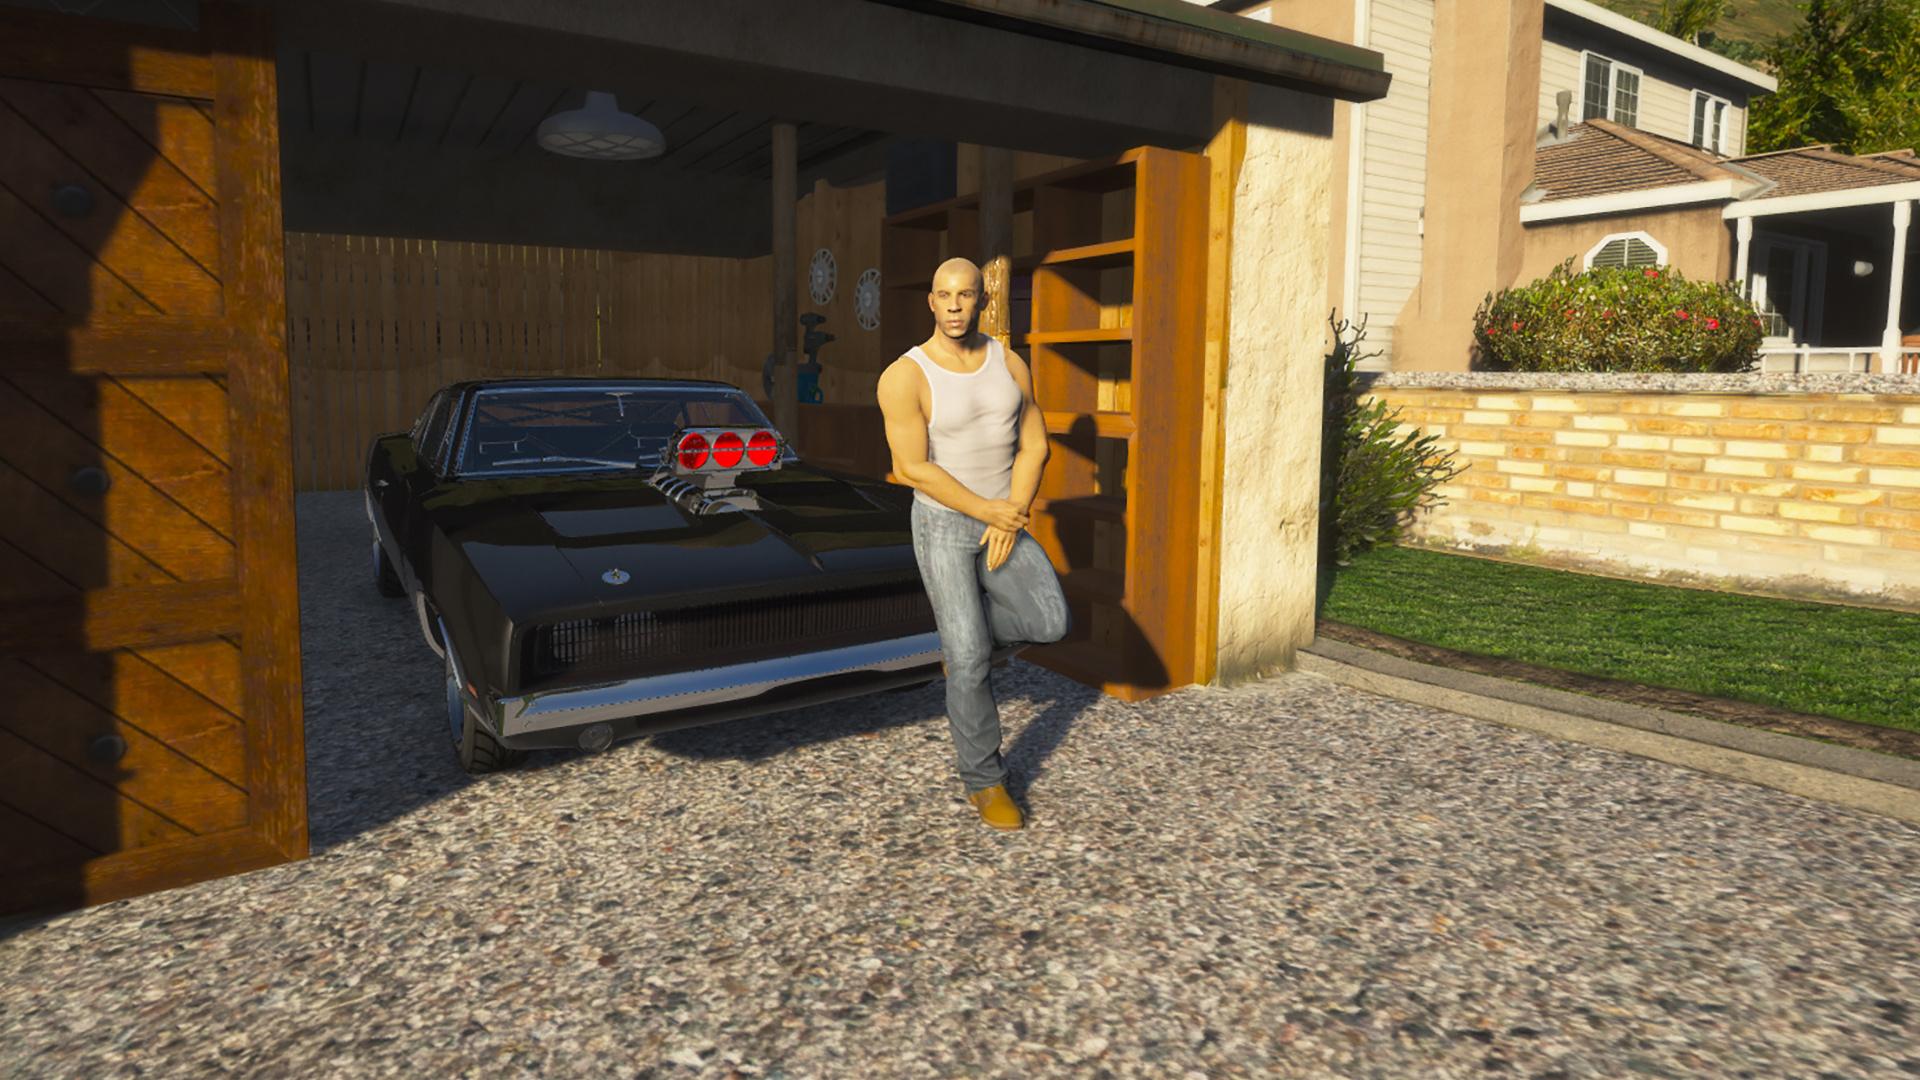 Fast & Furious 9 The Fast Saga Dom's Garage [MapEditor] 1.0